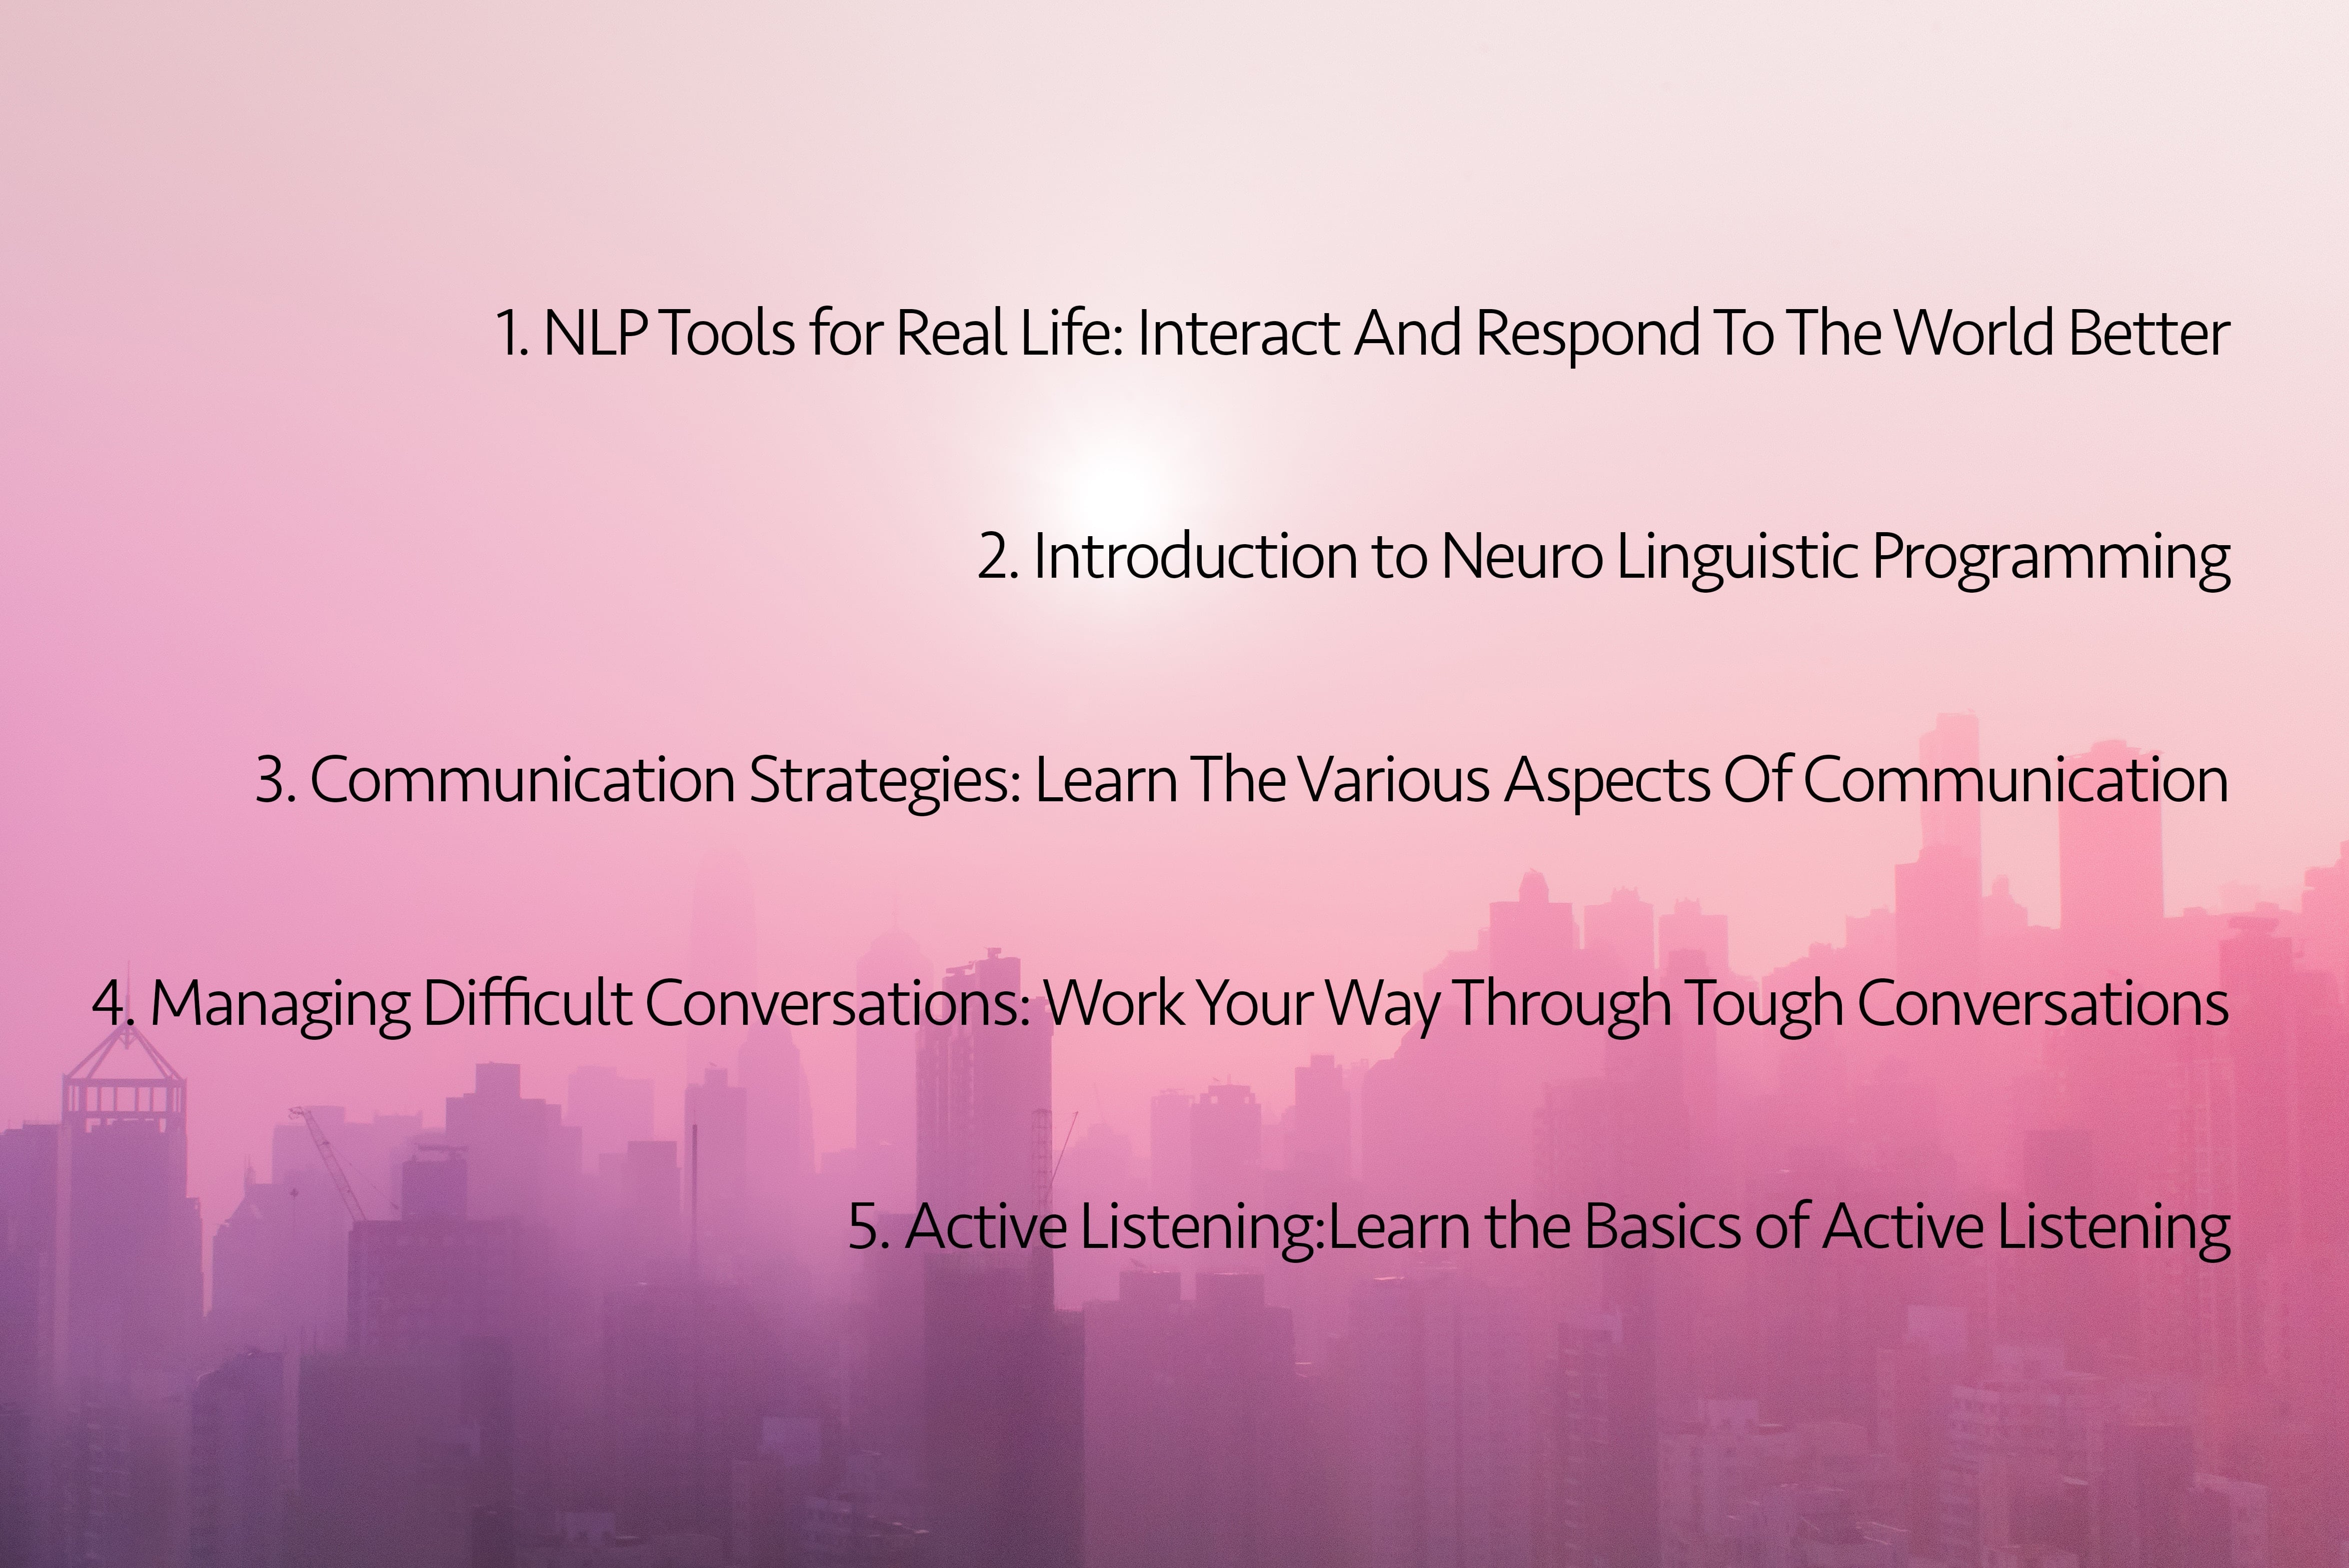 NLP Tools and Communication Strategies Training Bundle - $29 - meiying ng 581604 unsplash